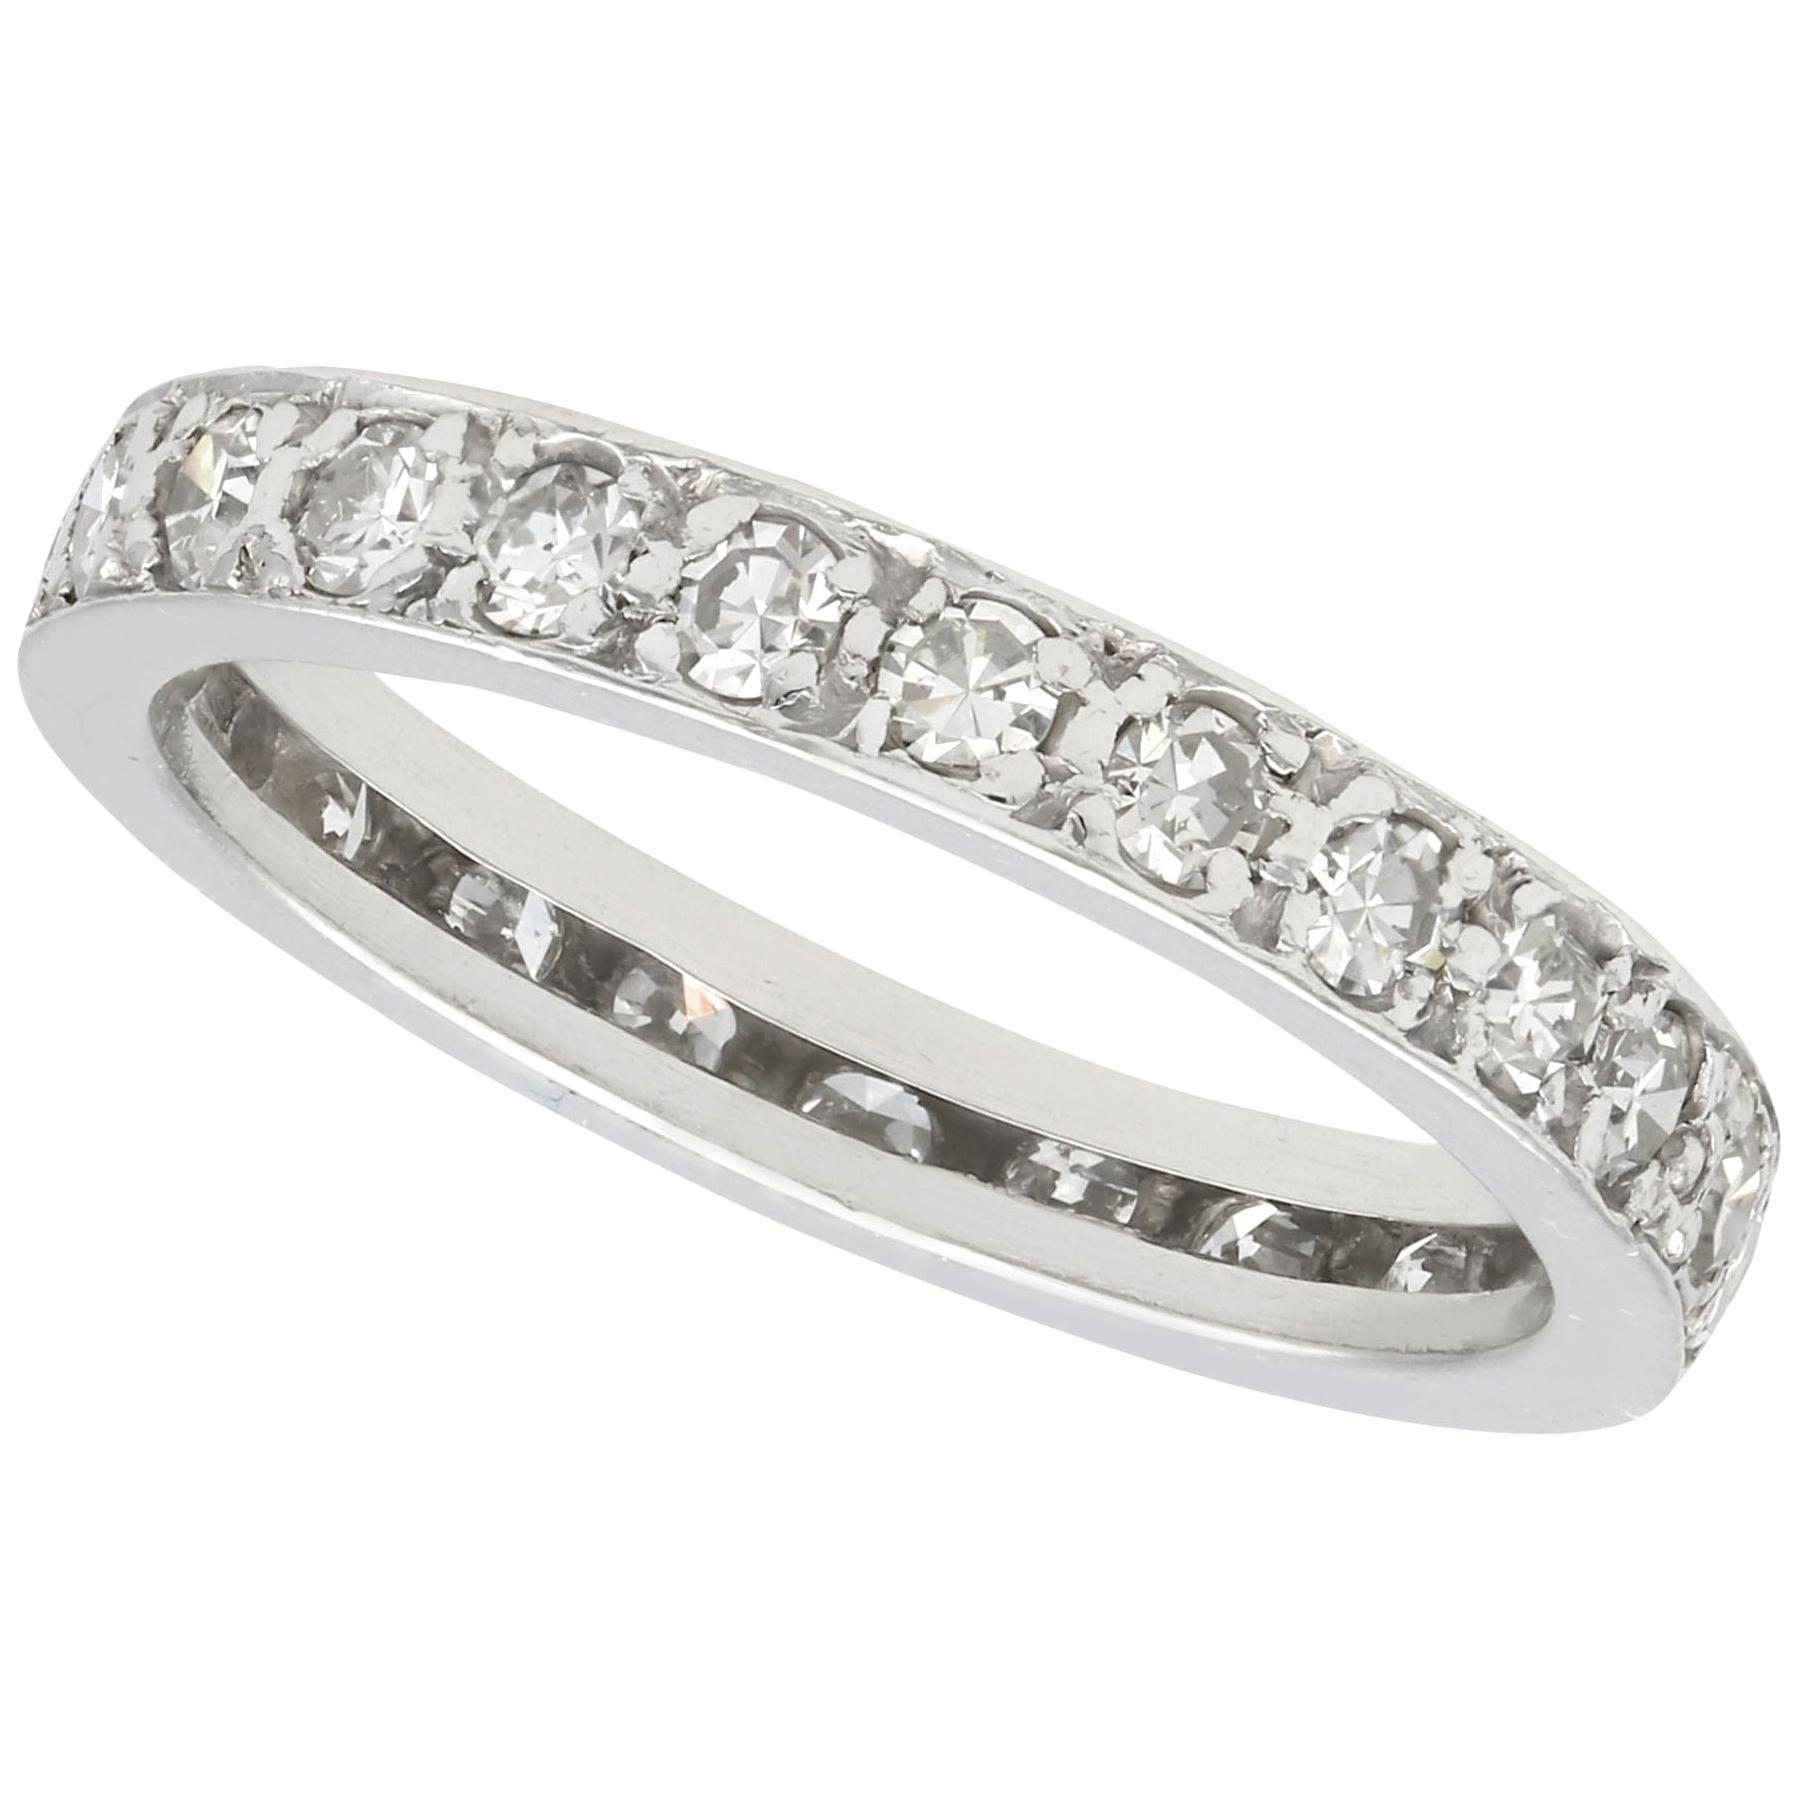 Antique Diamond and White Gold Full Eternity Ring, circa 1930